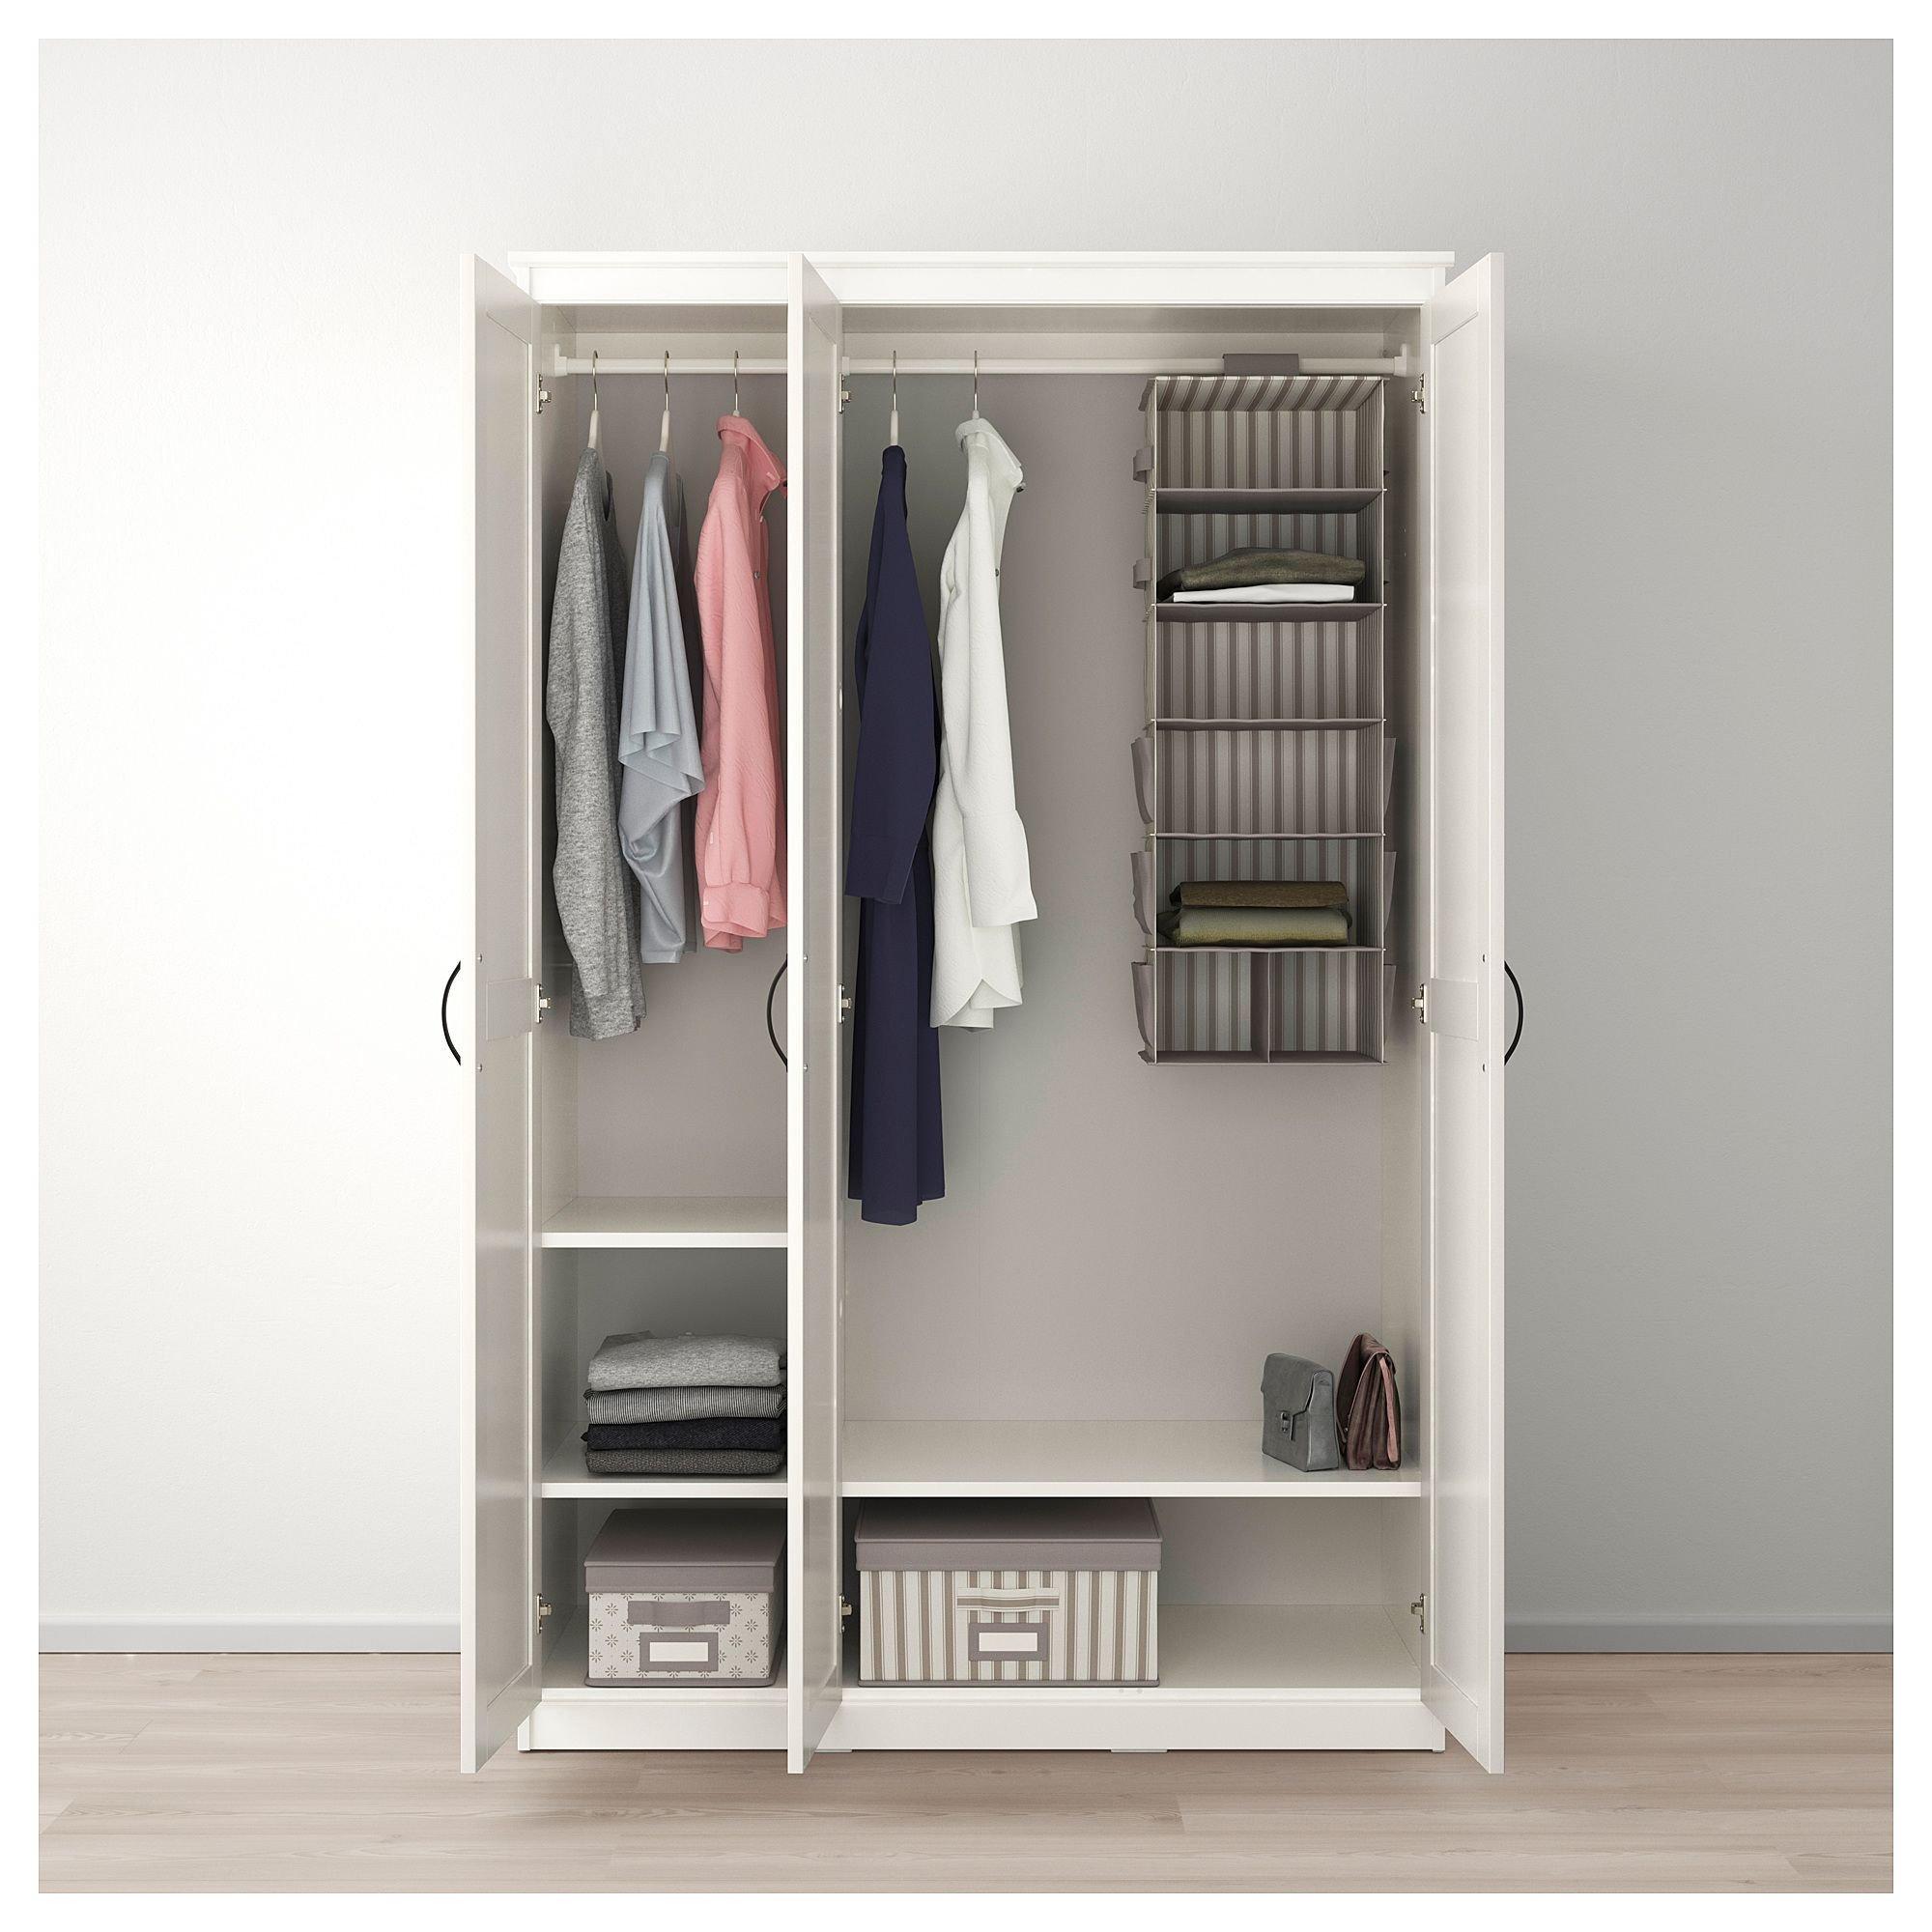 Ikea Bedroom Furniture Wardrobes Best Of Ikea songesand Wardrobe White